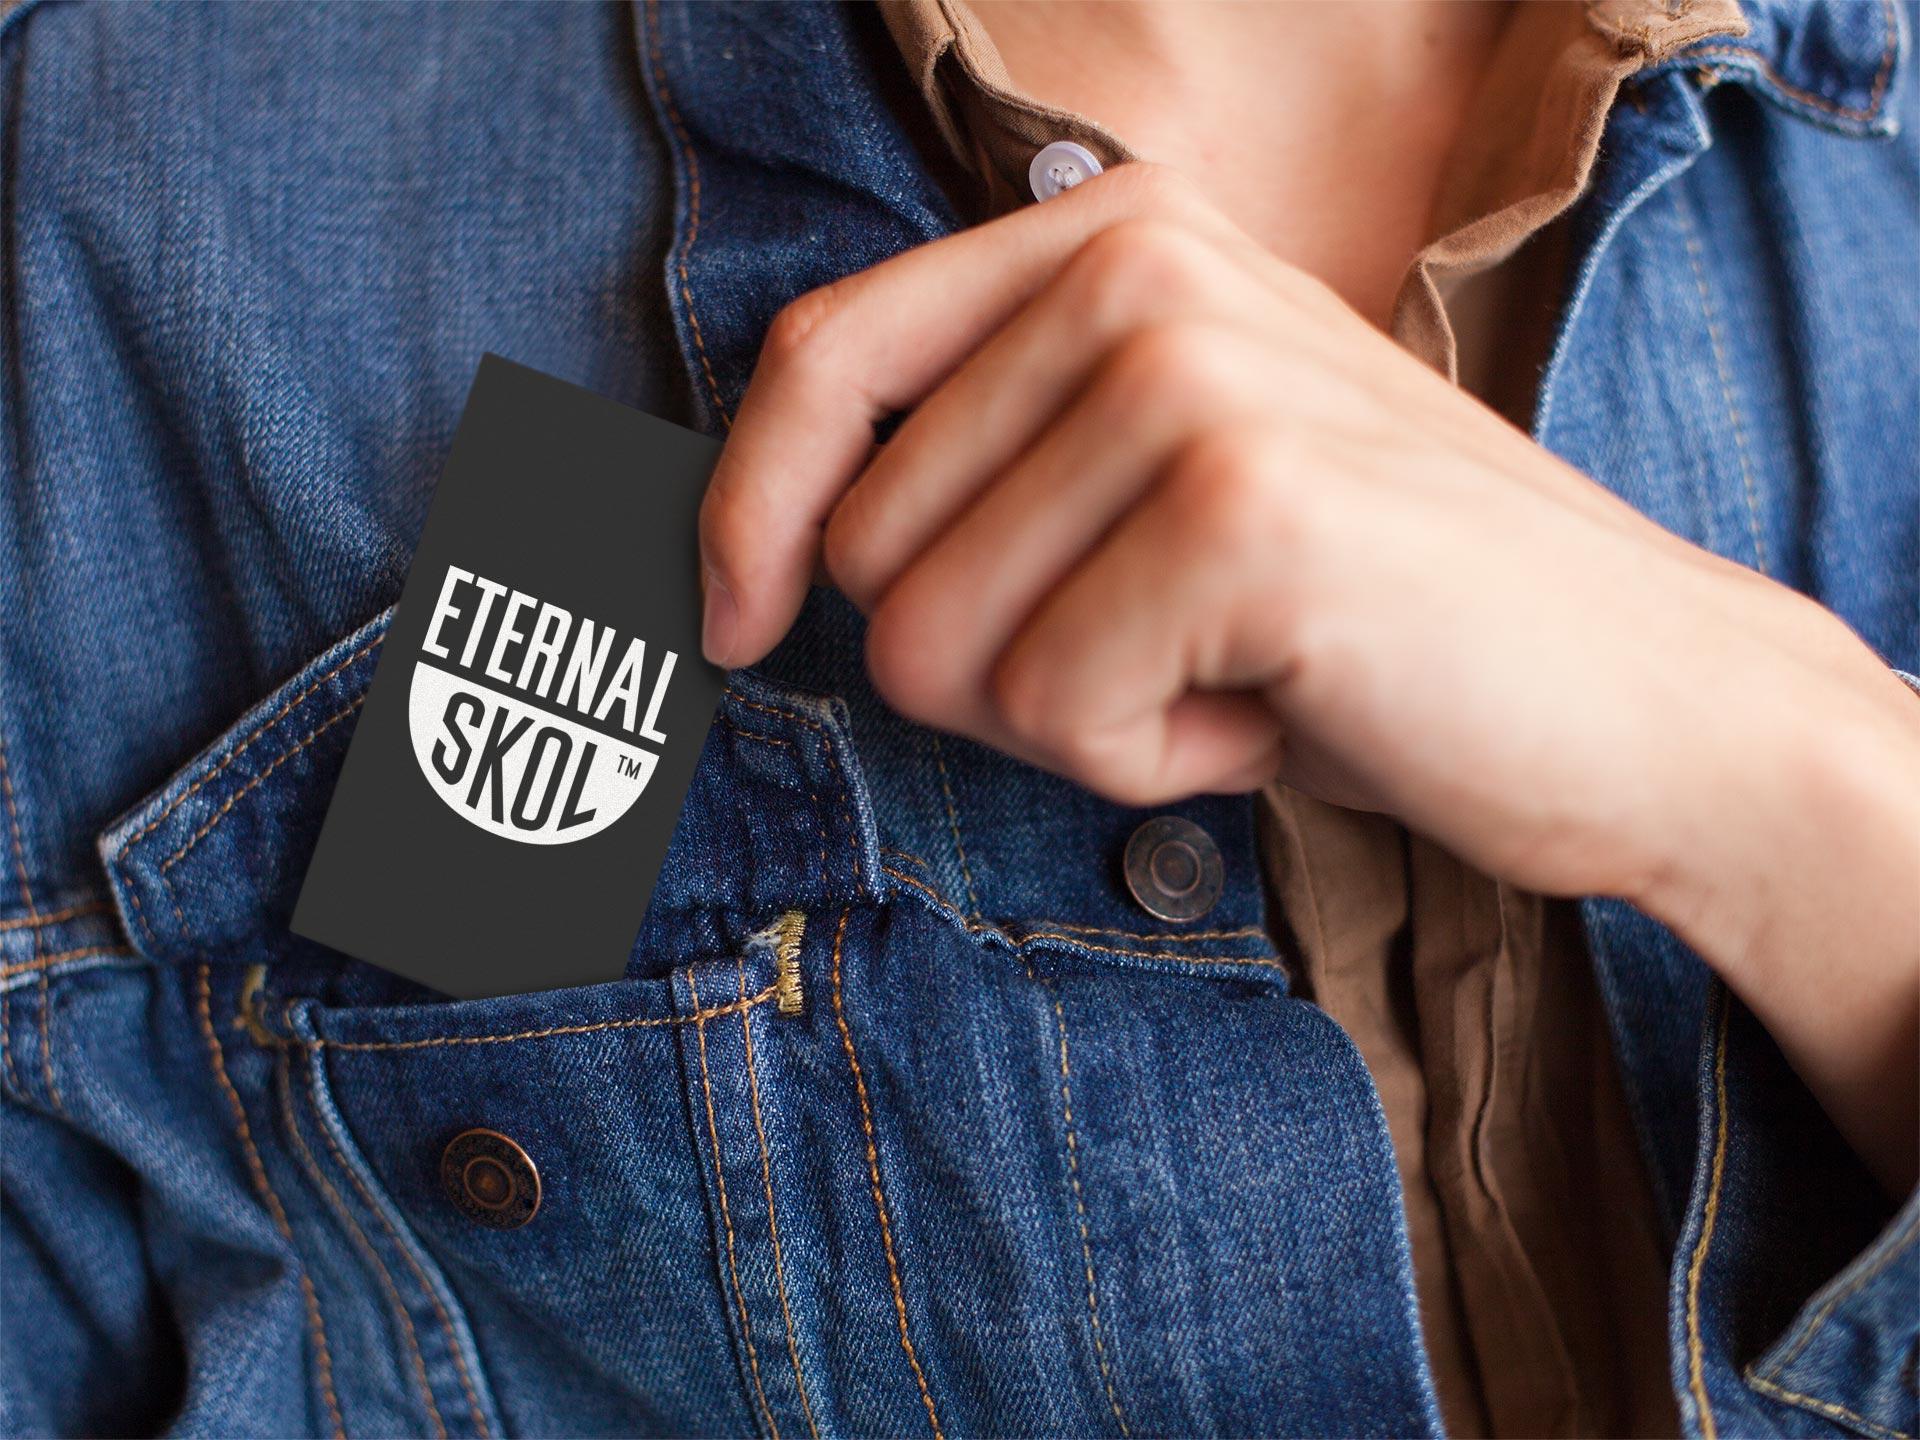 Eternal Skol - Business Card Design